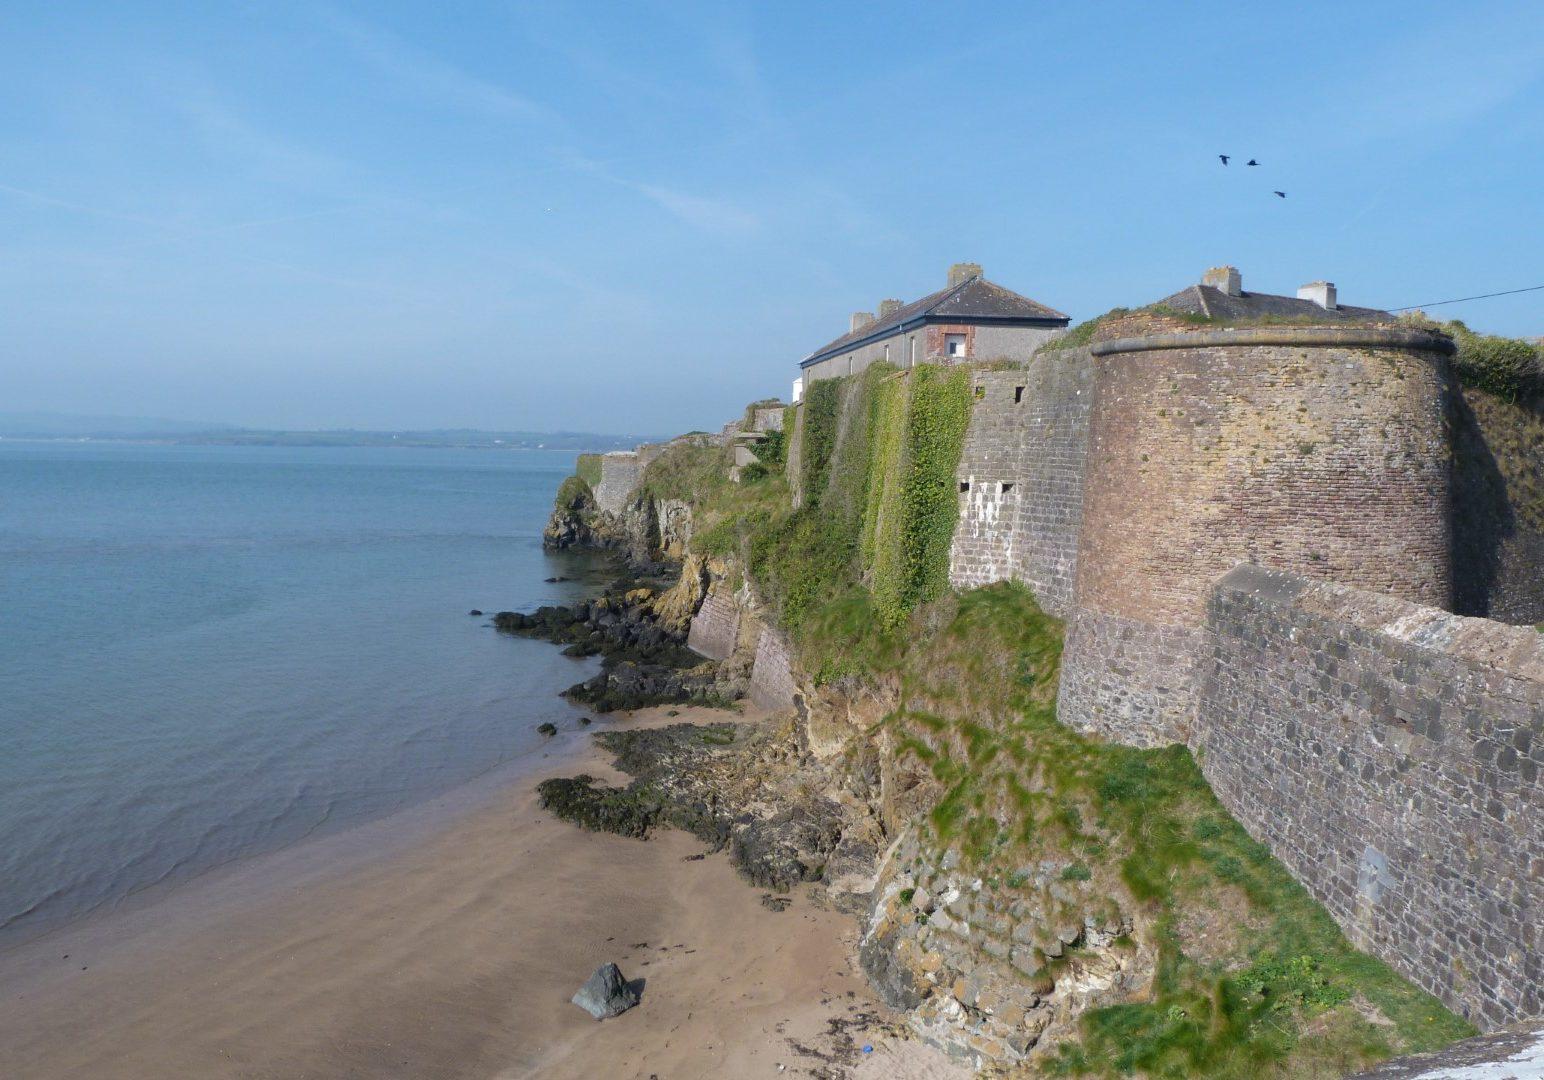 Duncannon Fort overlooking Duncannon Beach, Wexford